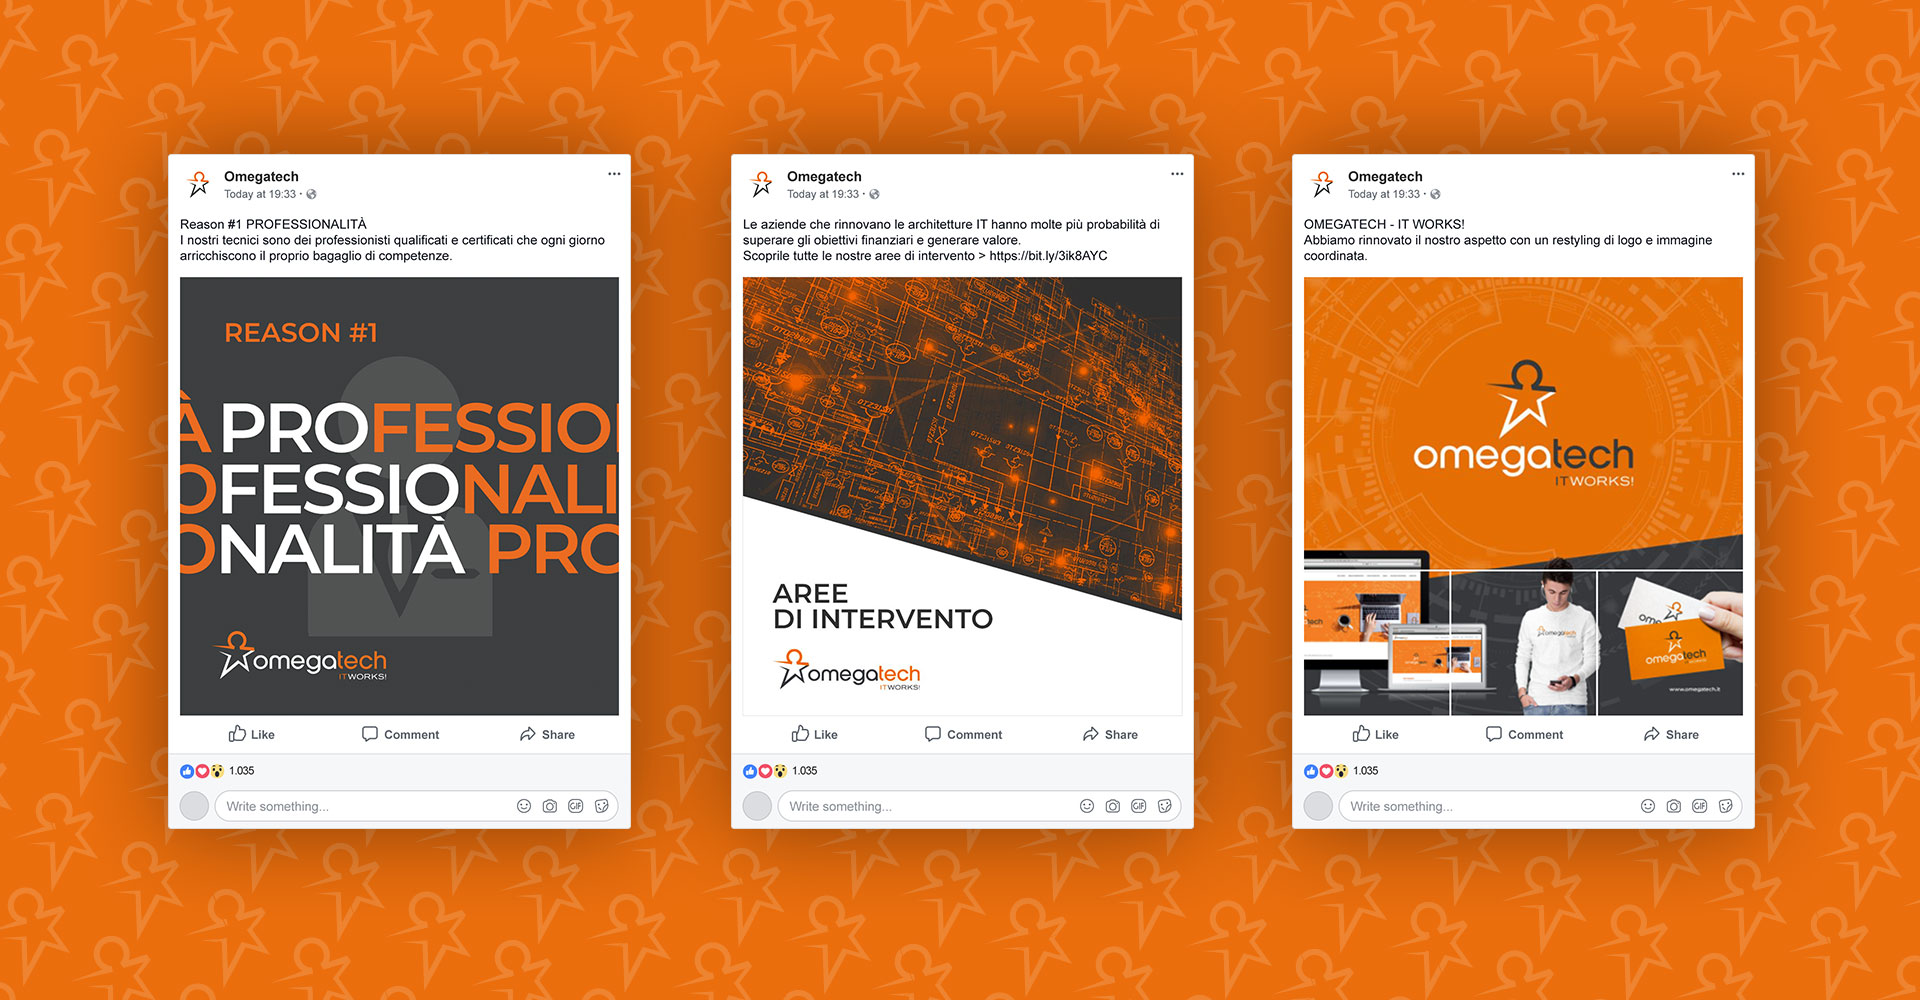 omegatech-zerouno-design-instagram-posts